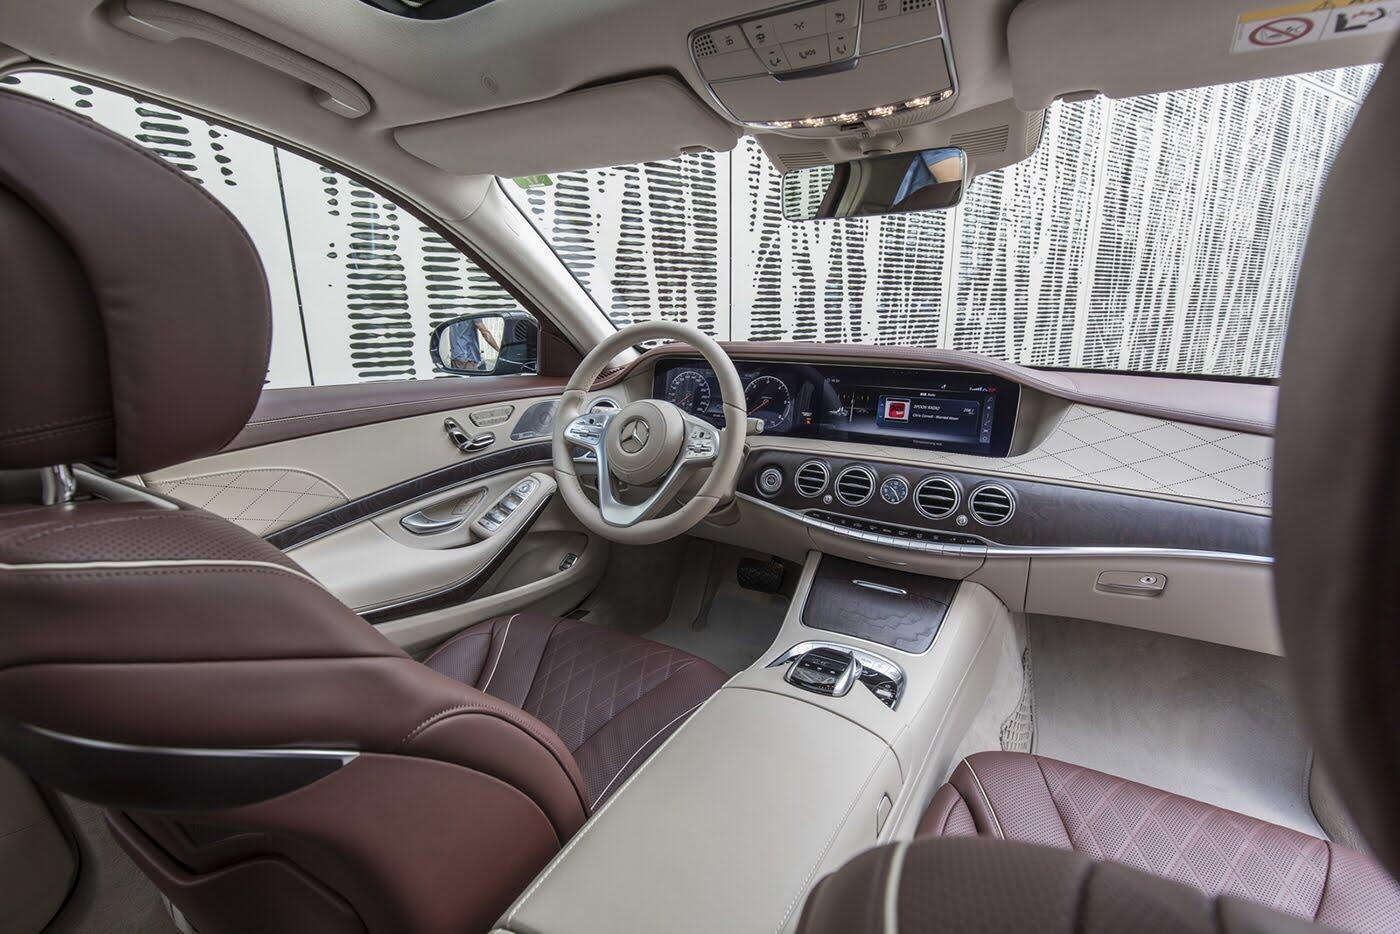 Ảnh chi tiết Mercedes-Benz S-Class 2018 - Hình 22